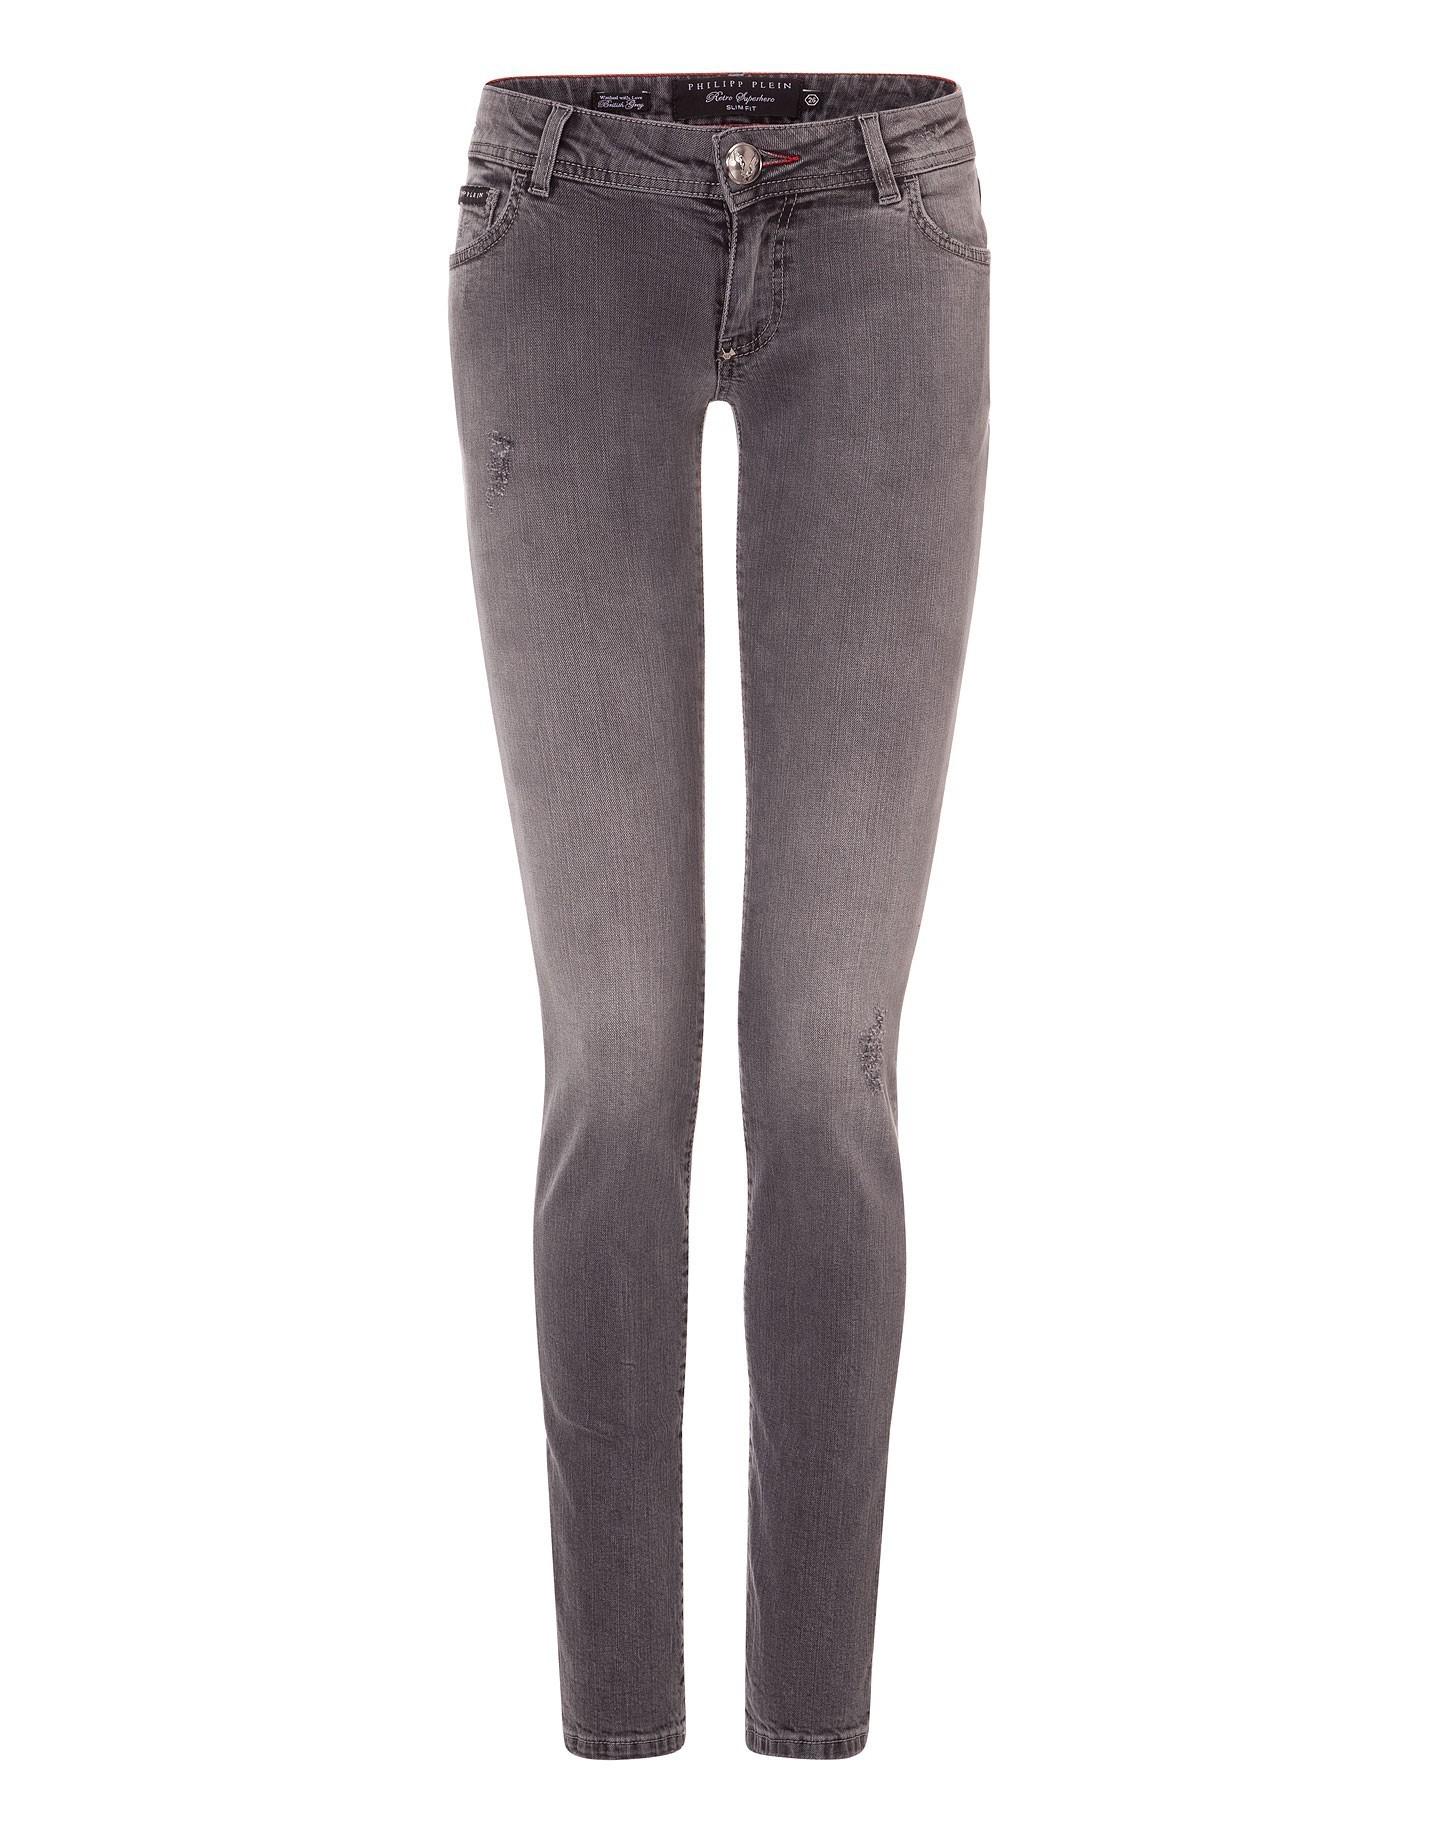 "Philipp plein jeans ""carla"" cw580931"